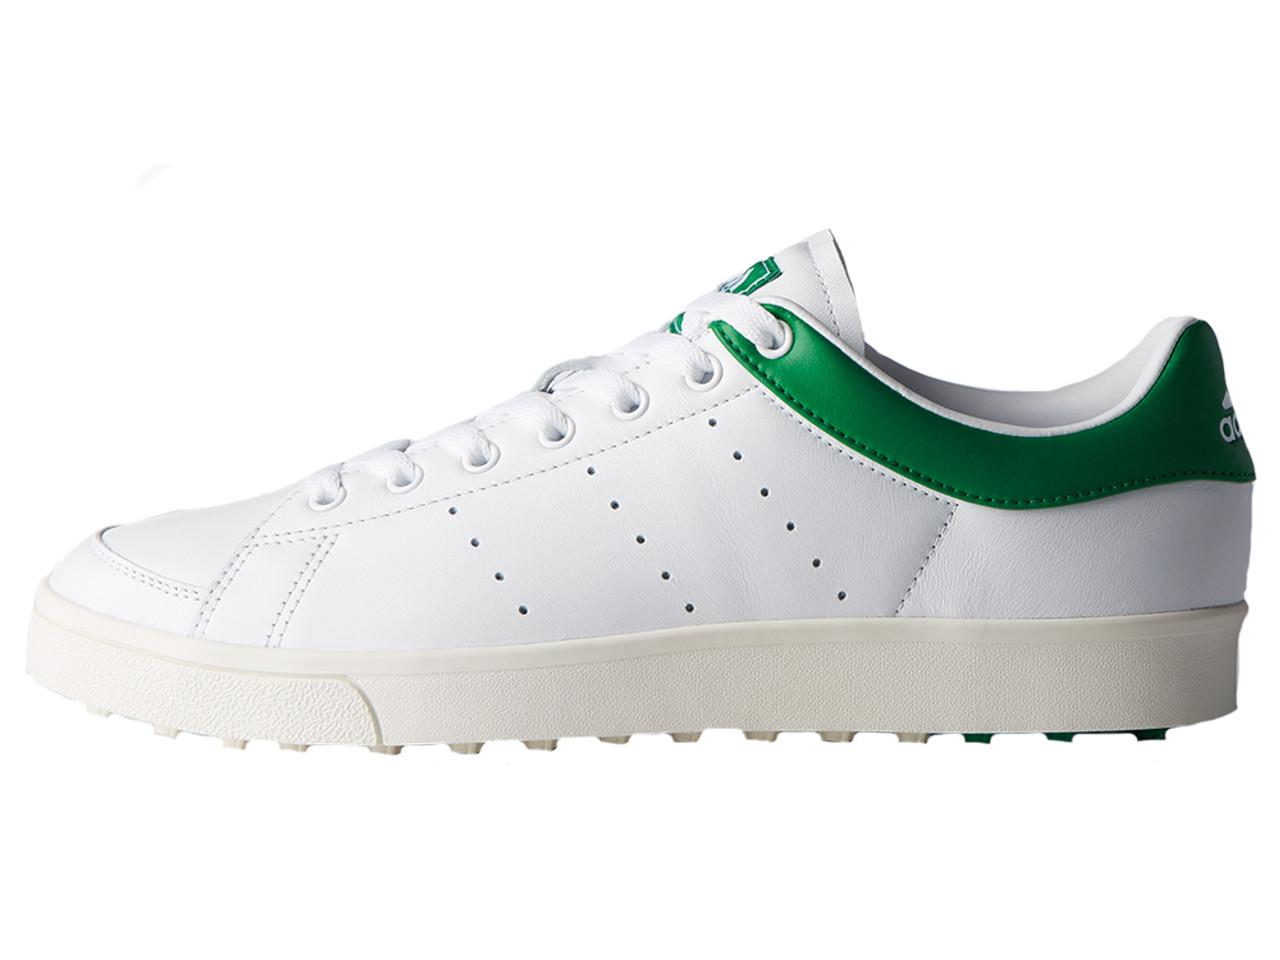 Adidas Adicross Classic Golf Shoes FTWR WhiteGreen